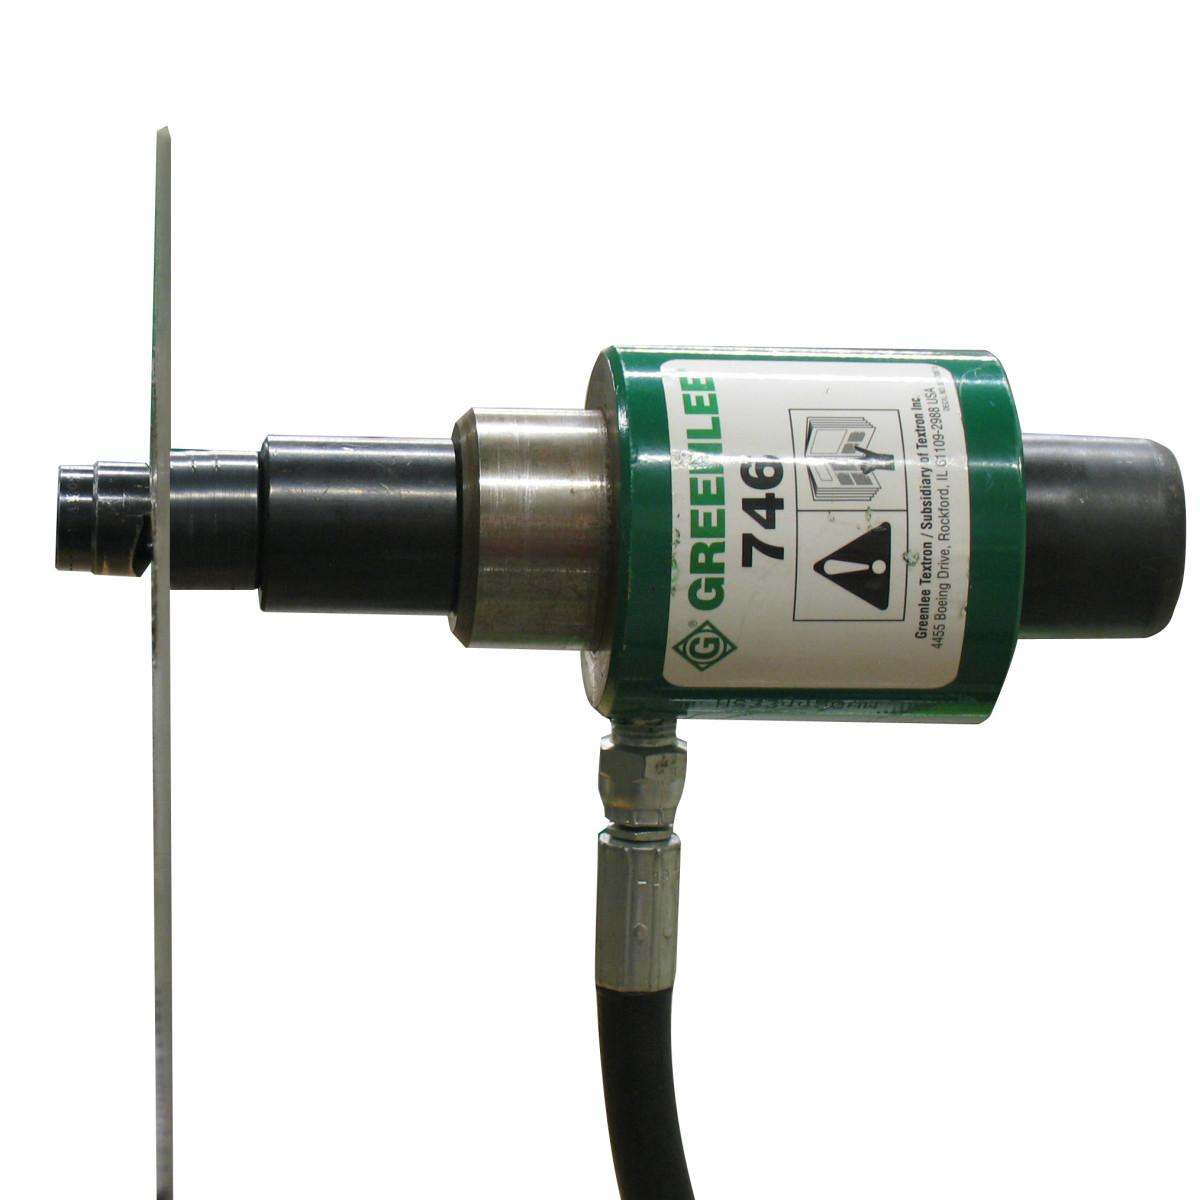 Greenlee 746 RAM-HYDRAULIC KNOCKOUT